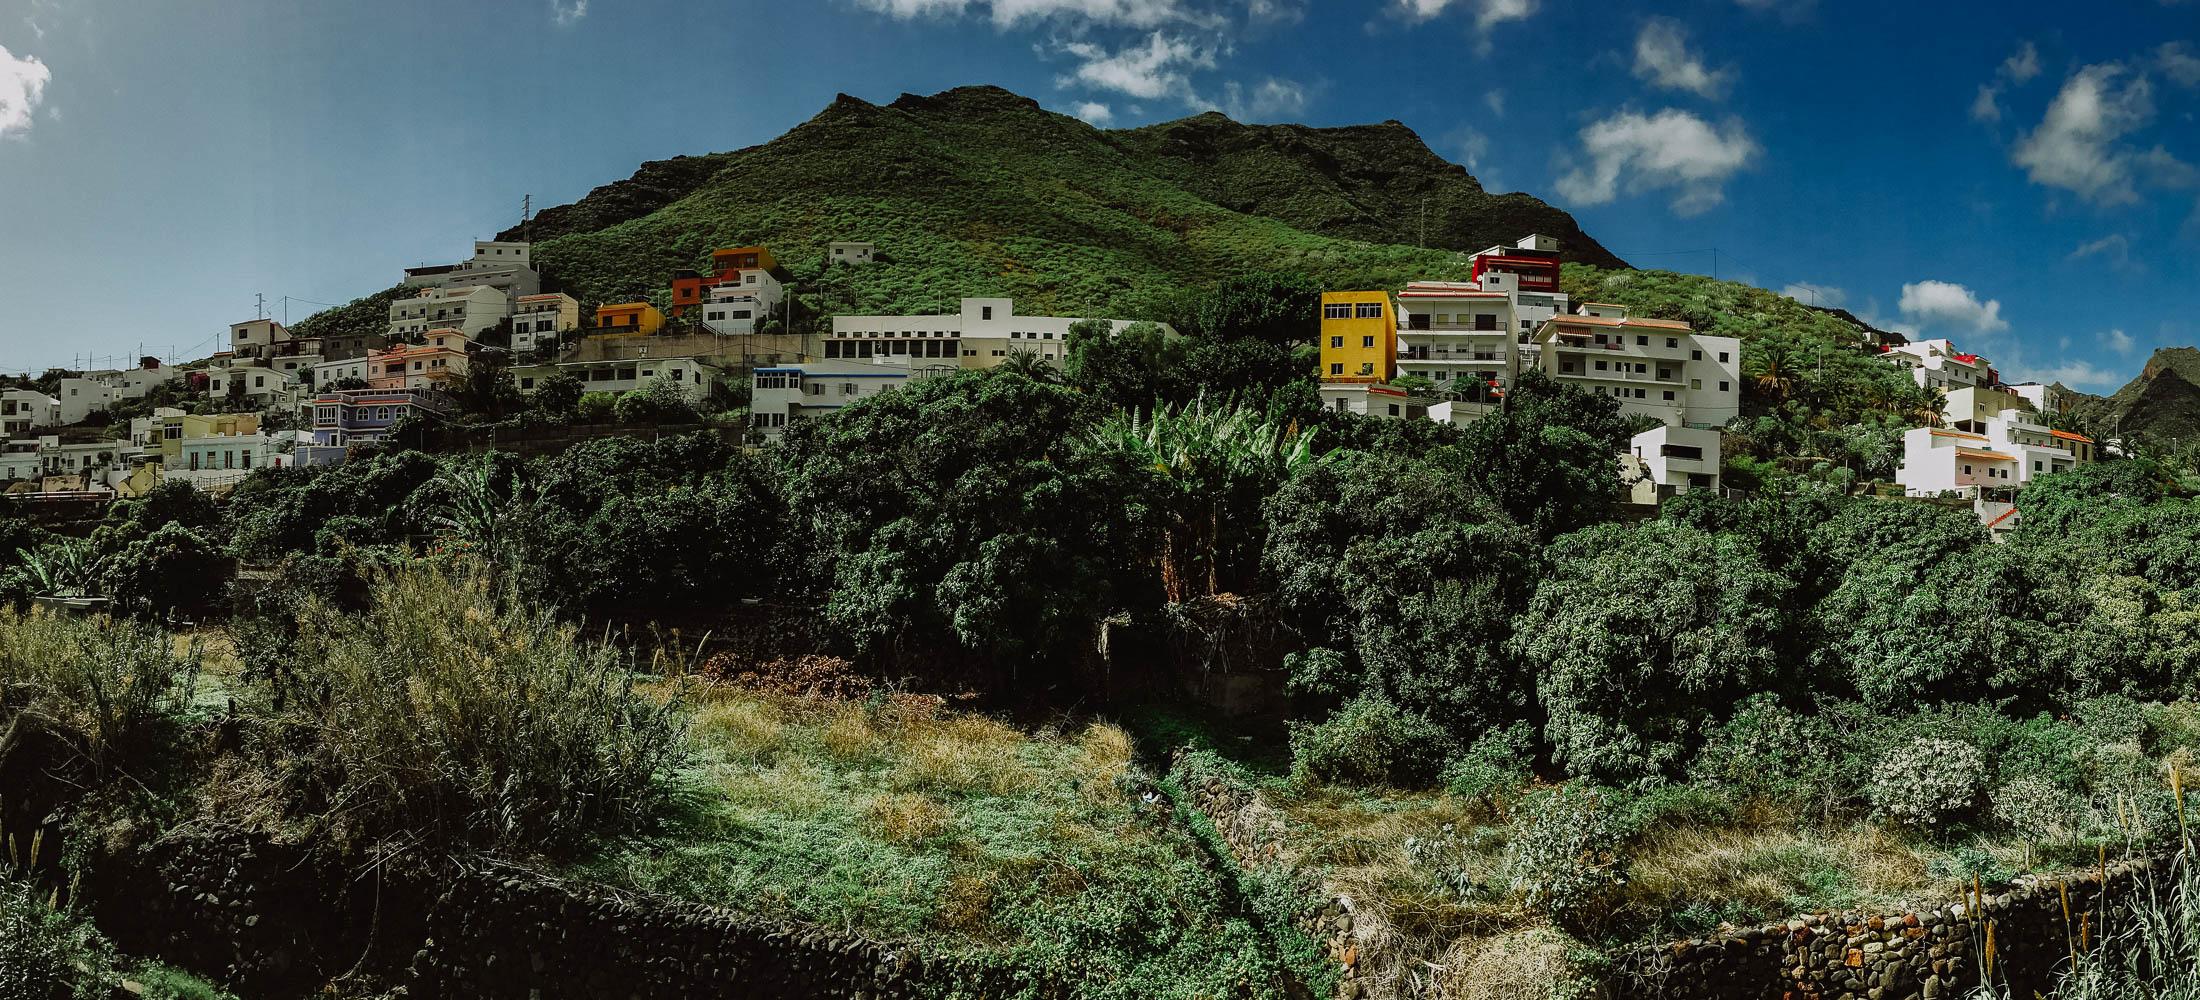 teneriffa-landscape-3960.jpg